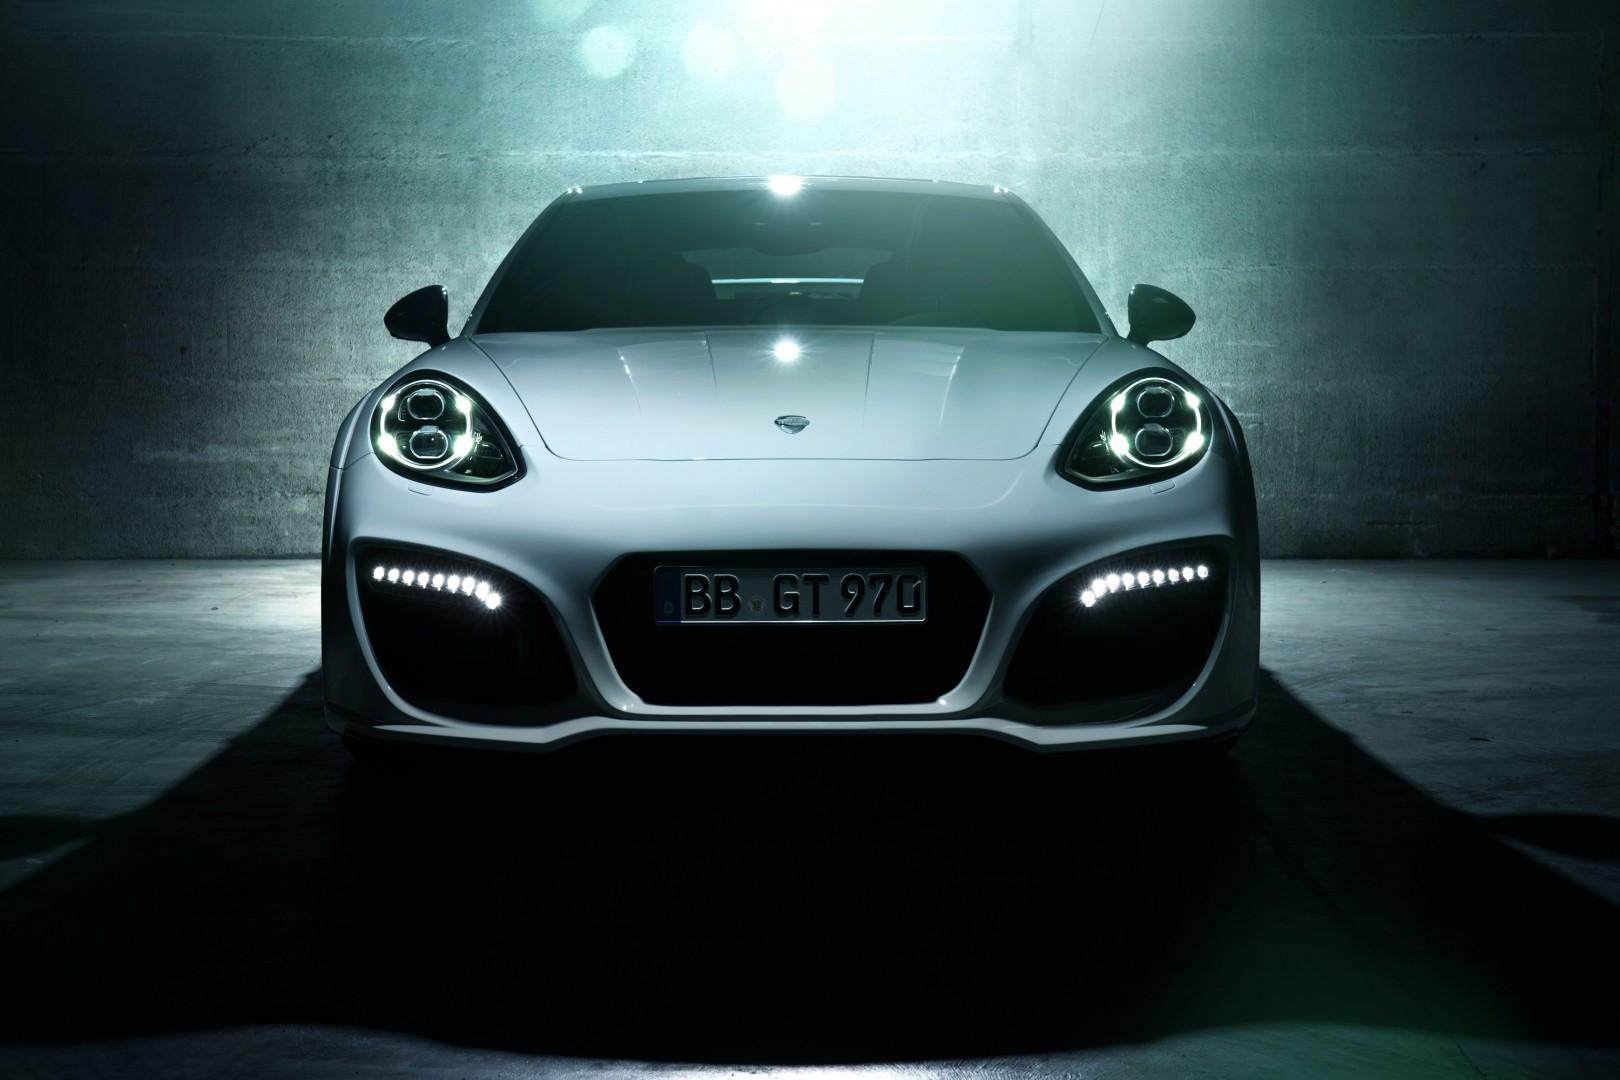 TECHART_GrandGT_for_Porsche_Panamera_Turbo_exterior3